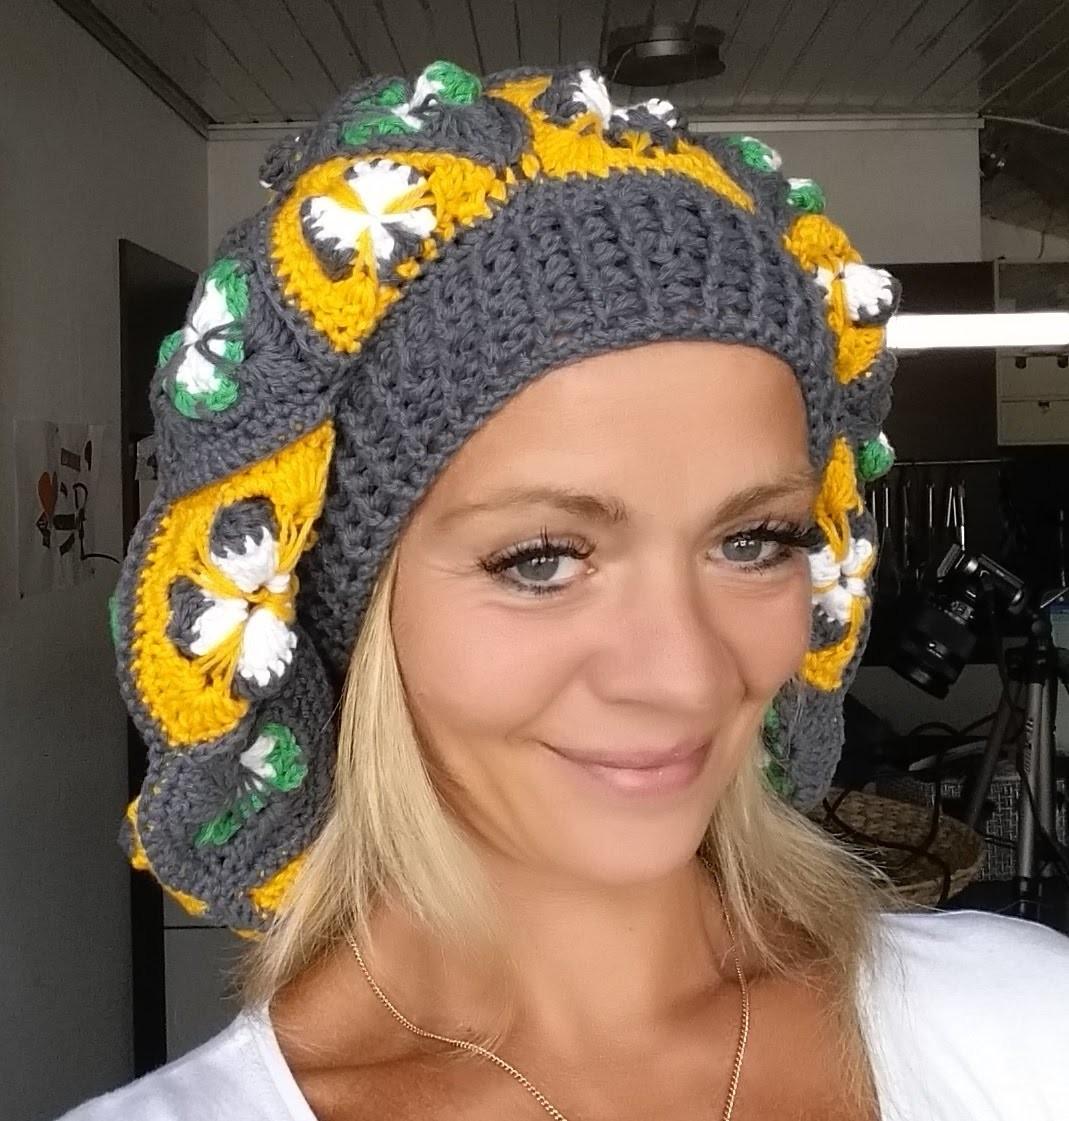 Crochet Ballon Mütze Sophie Teil 1# Häkeln mit Yve